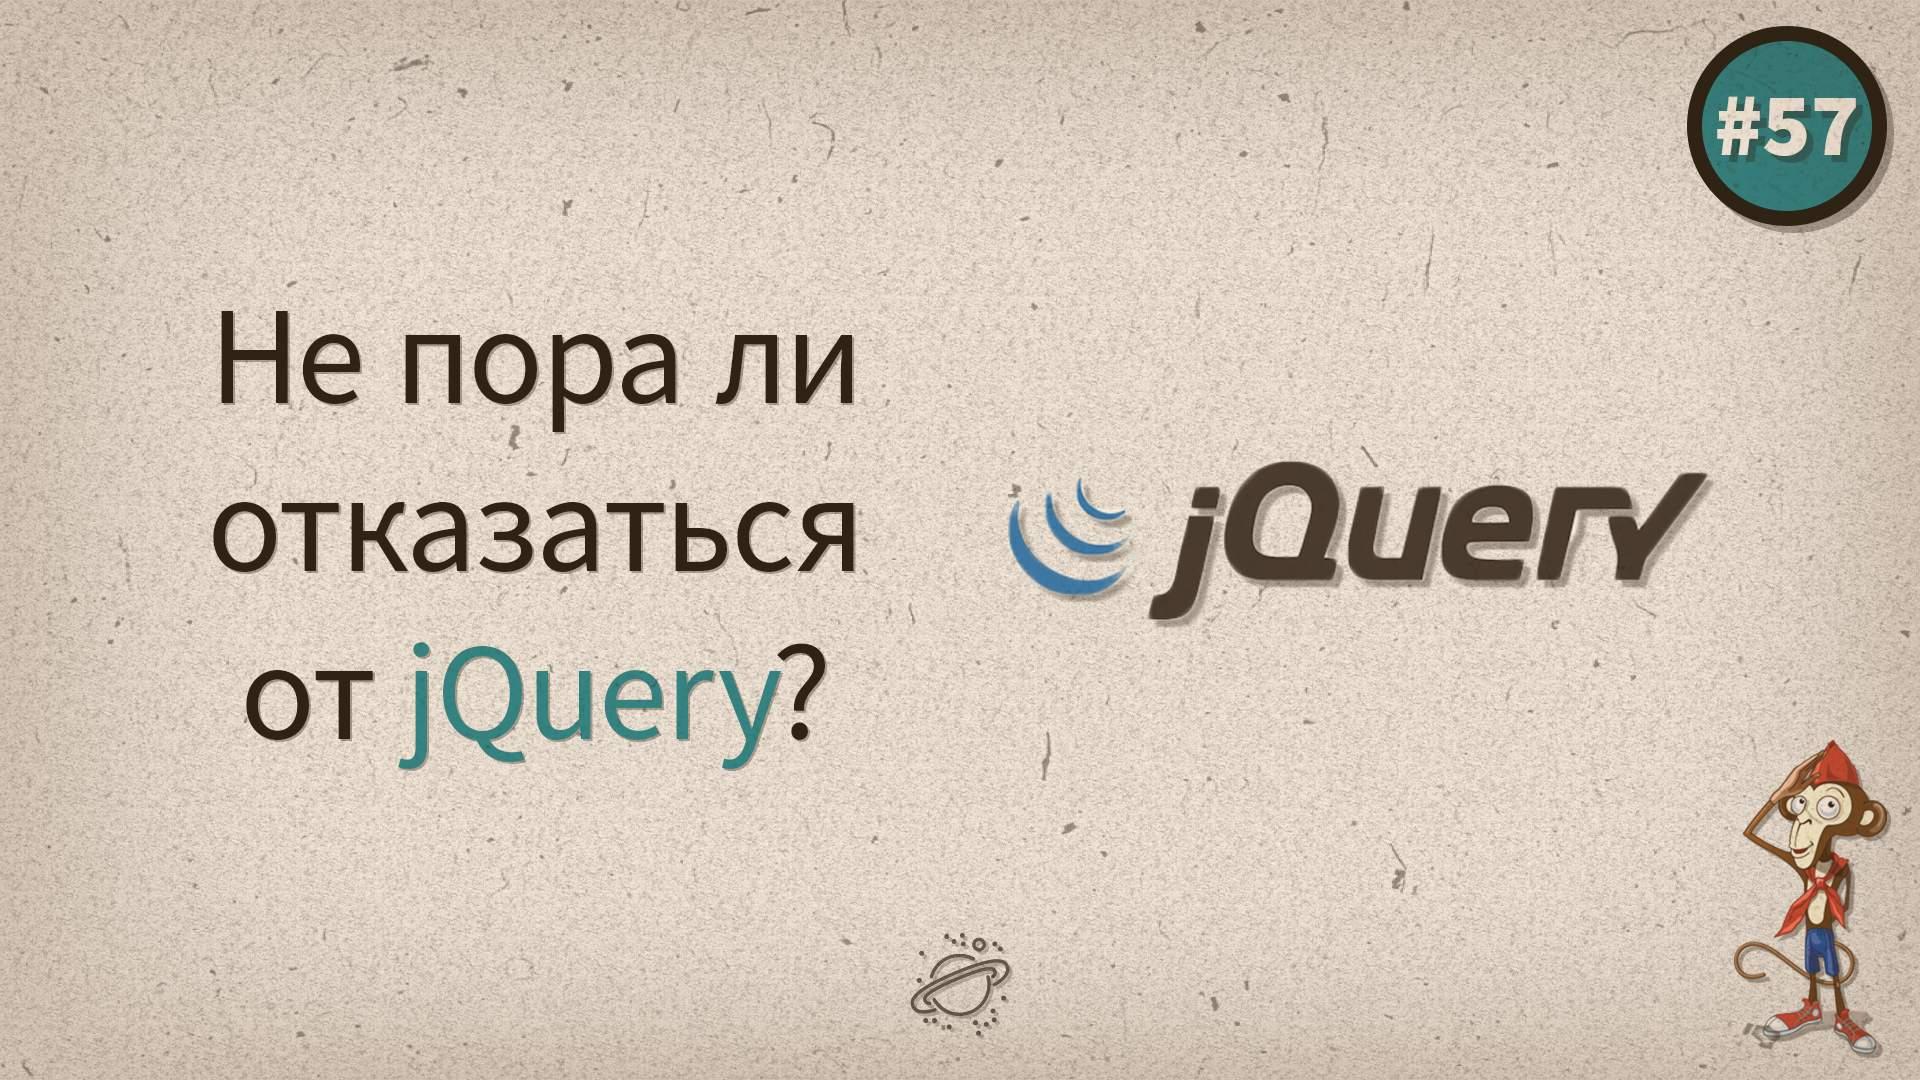 Не пора ли отказаться от jQuery?